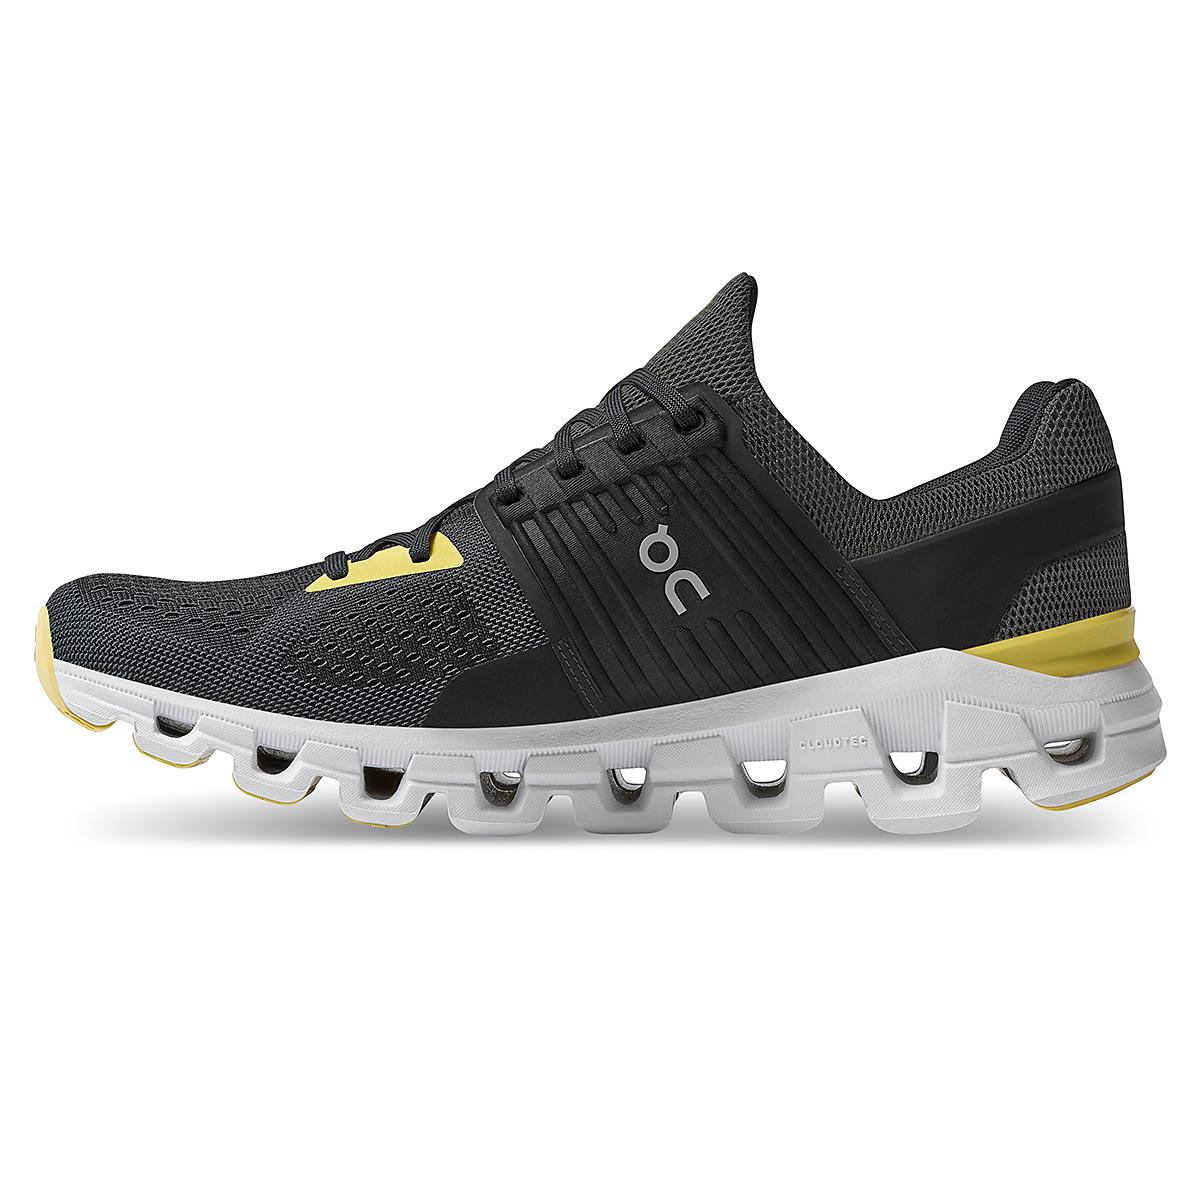 Men's On Cloudswift 2.0 Running Shoe - Color: Magnet/Citron - Size: 7 - Width: Regular, Magnet/Citron, large, image 2